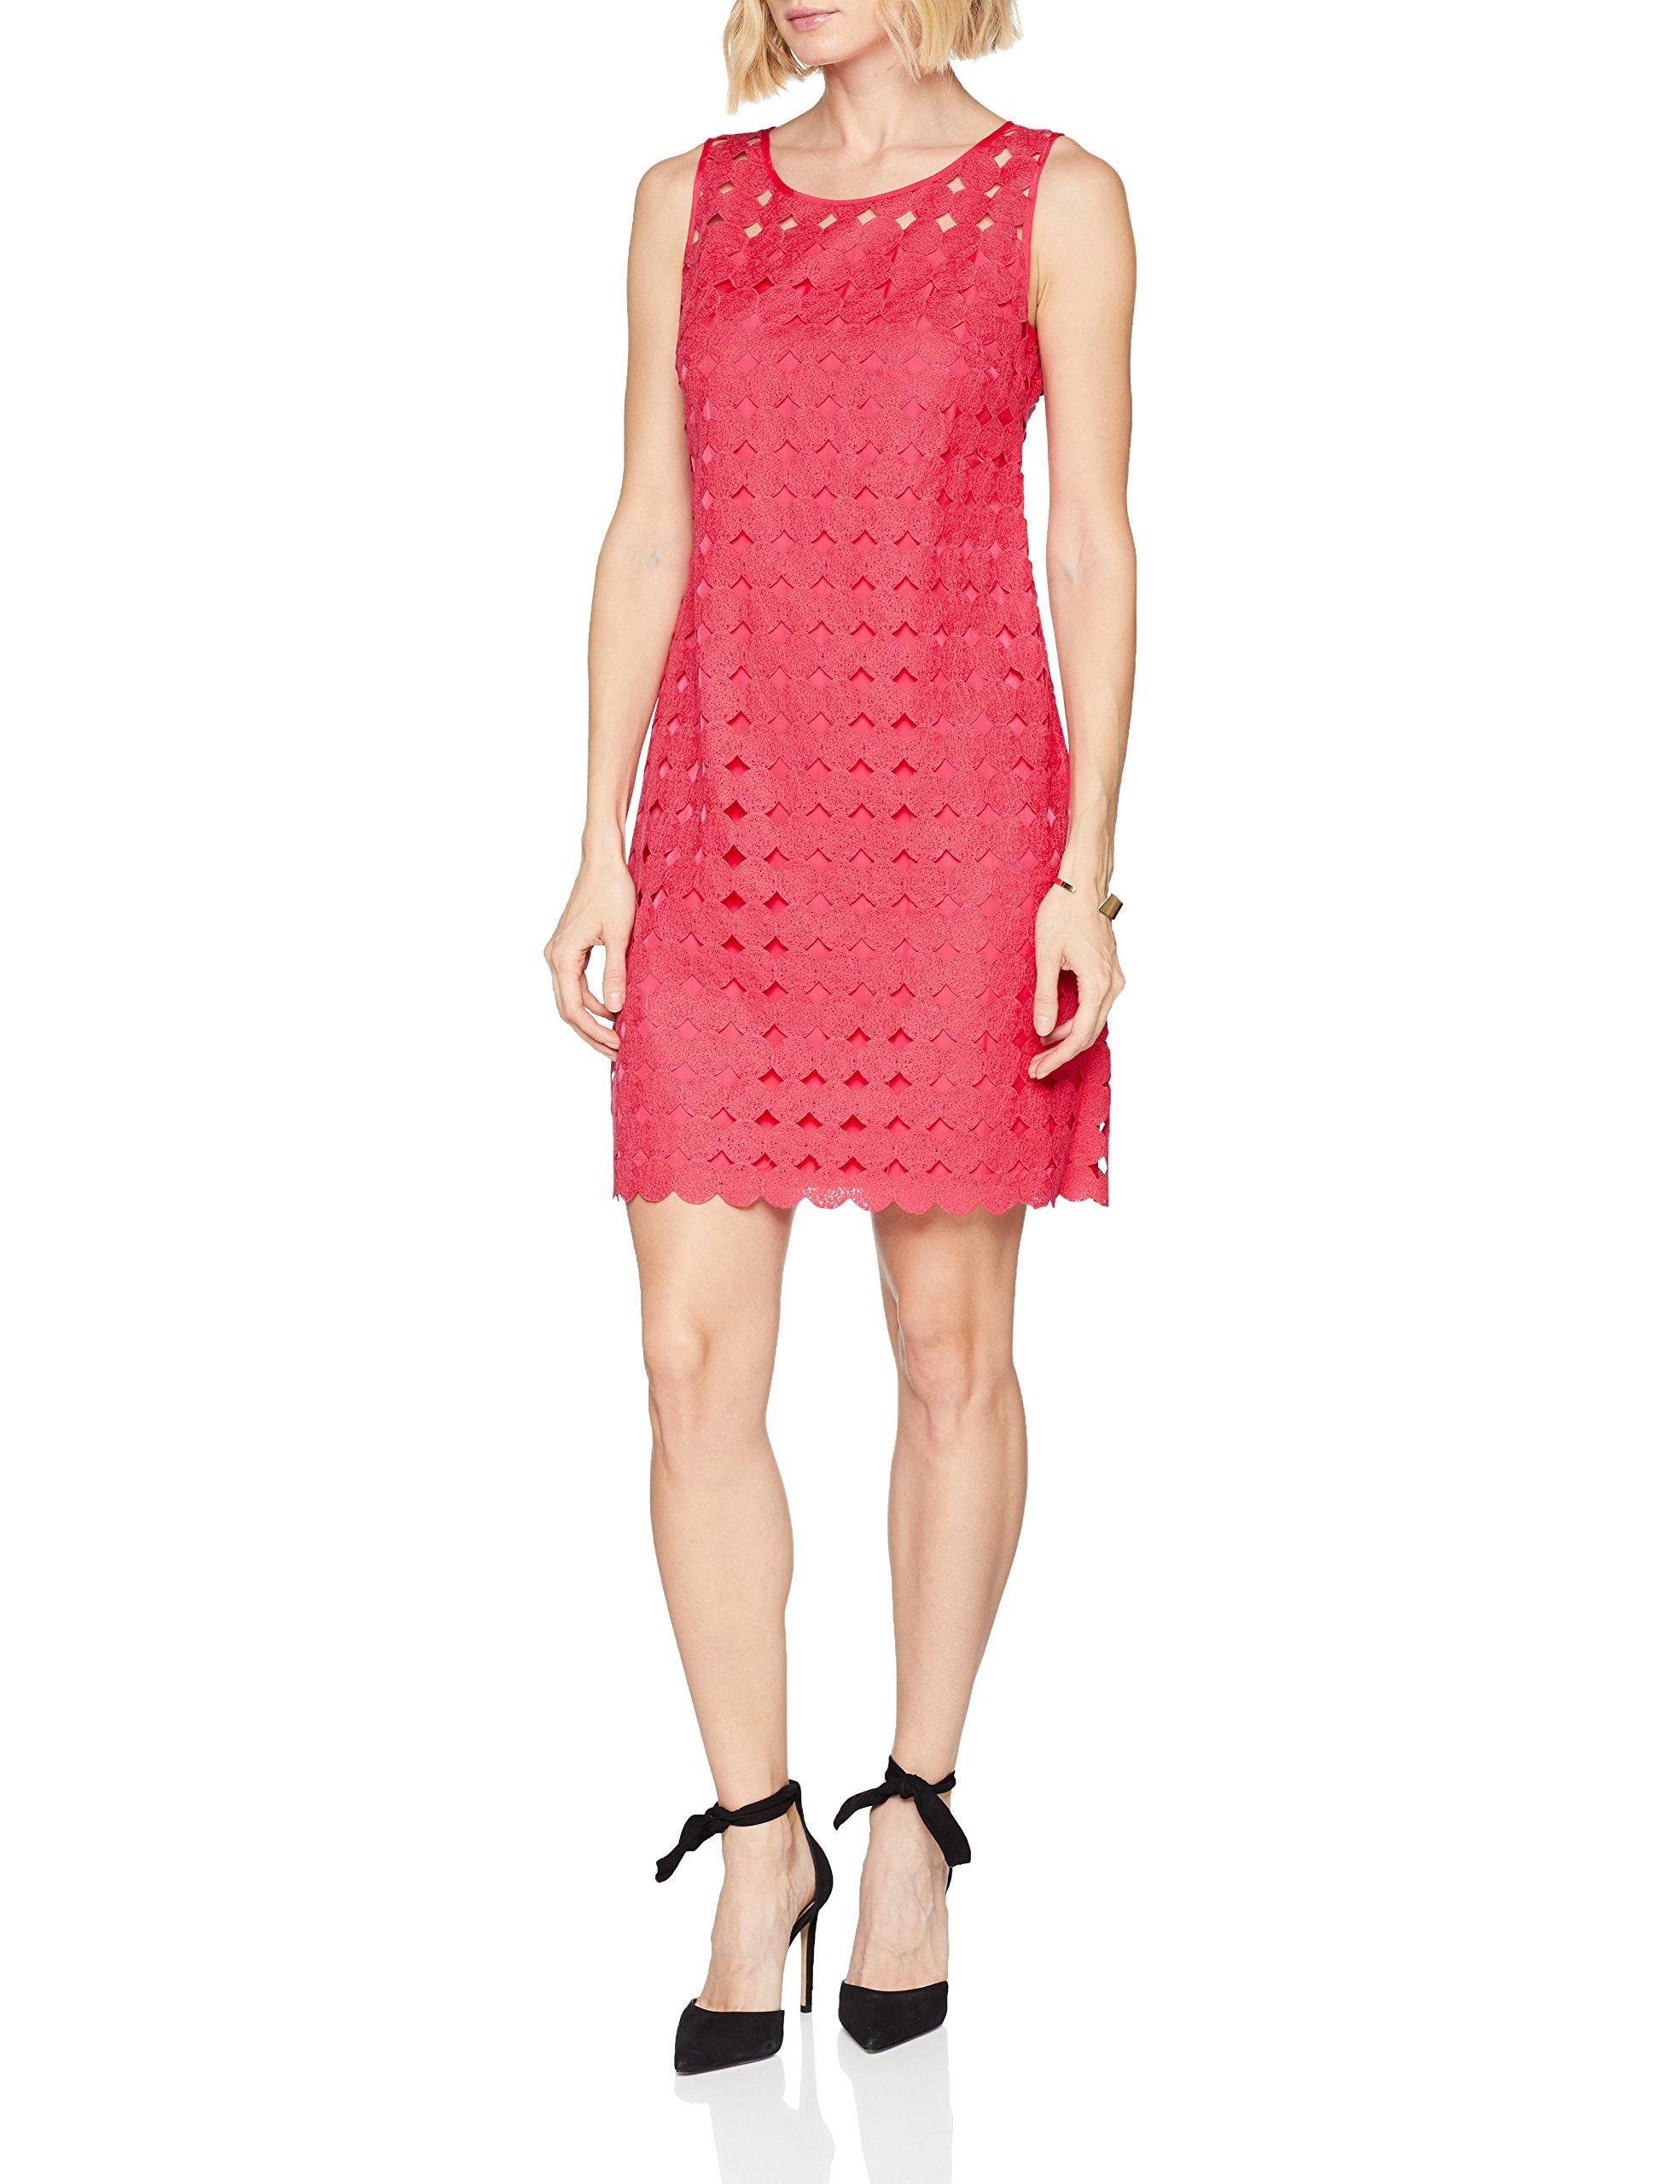 Femme Kleid GewebeRobe Taifun 60598Fr42taille Roseraspberry Pink Fabricant40 7bvfgy6Y